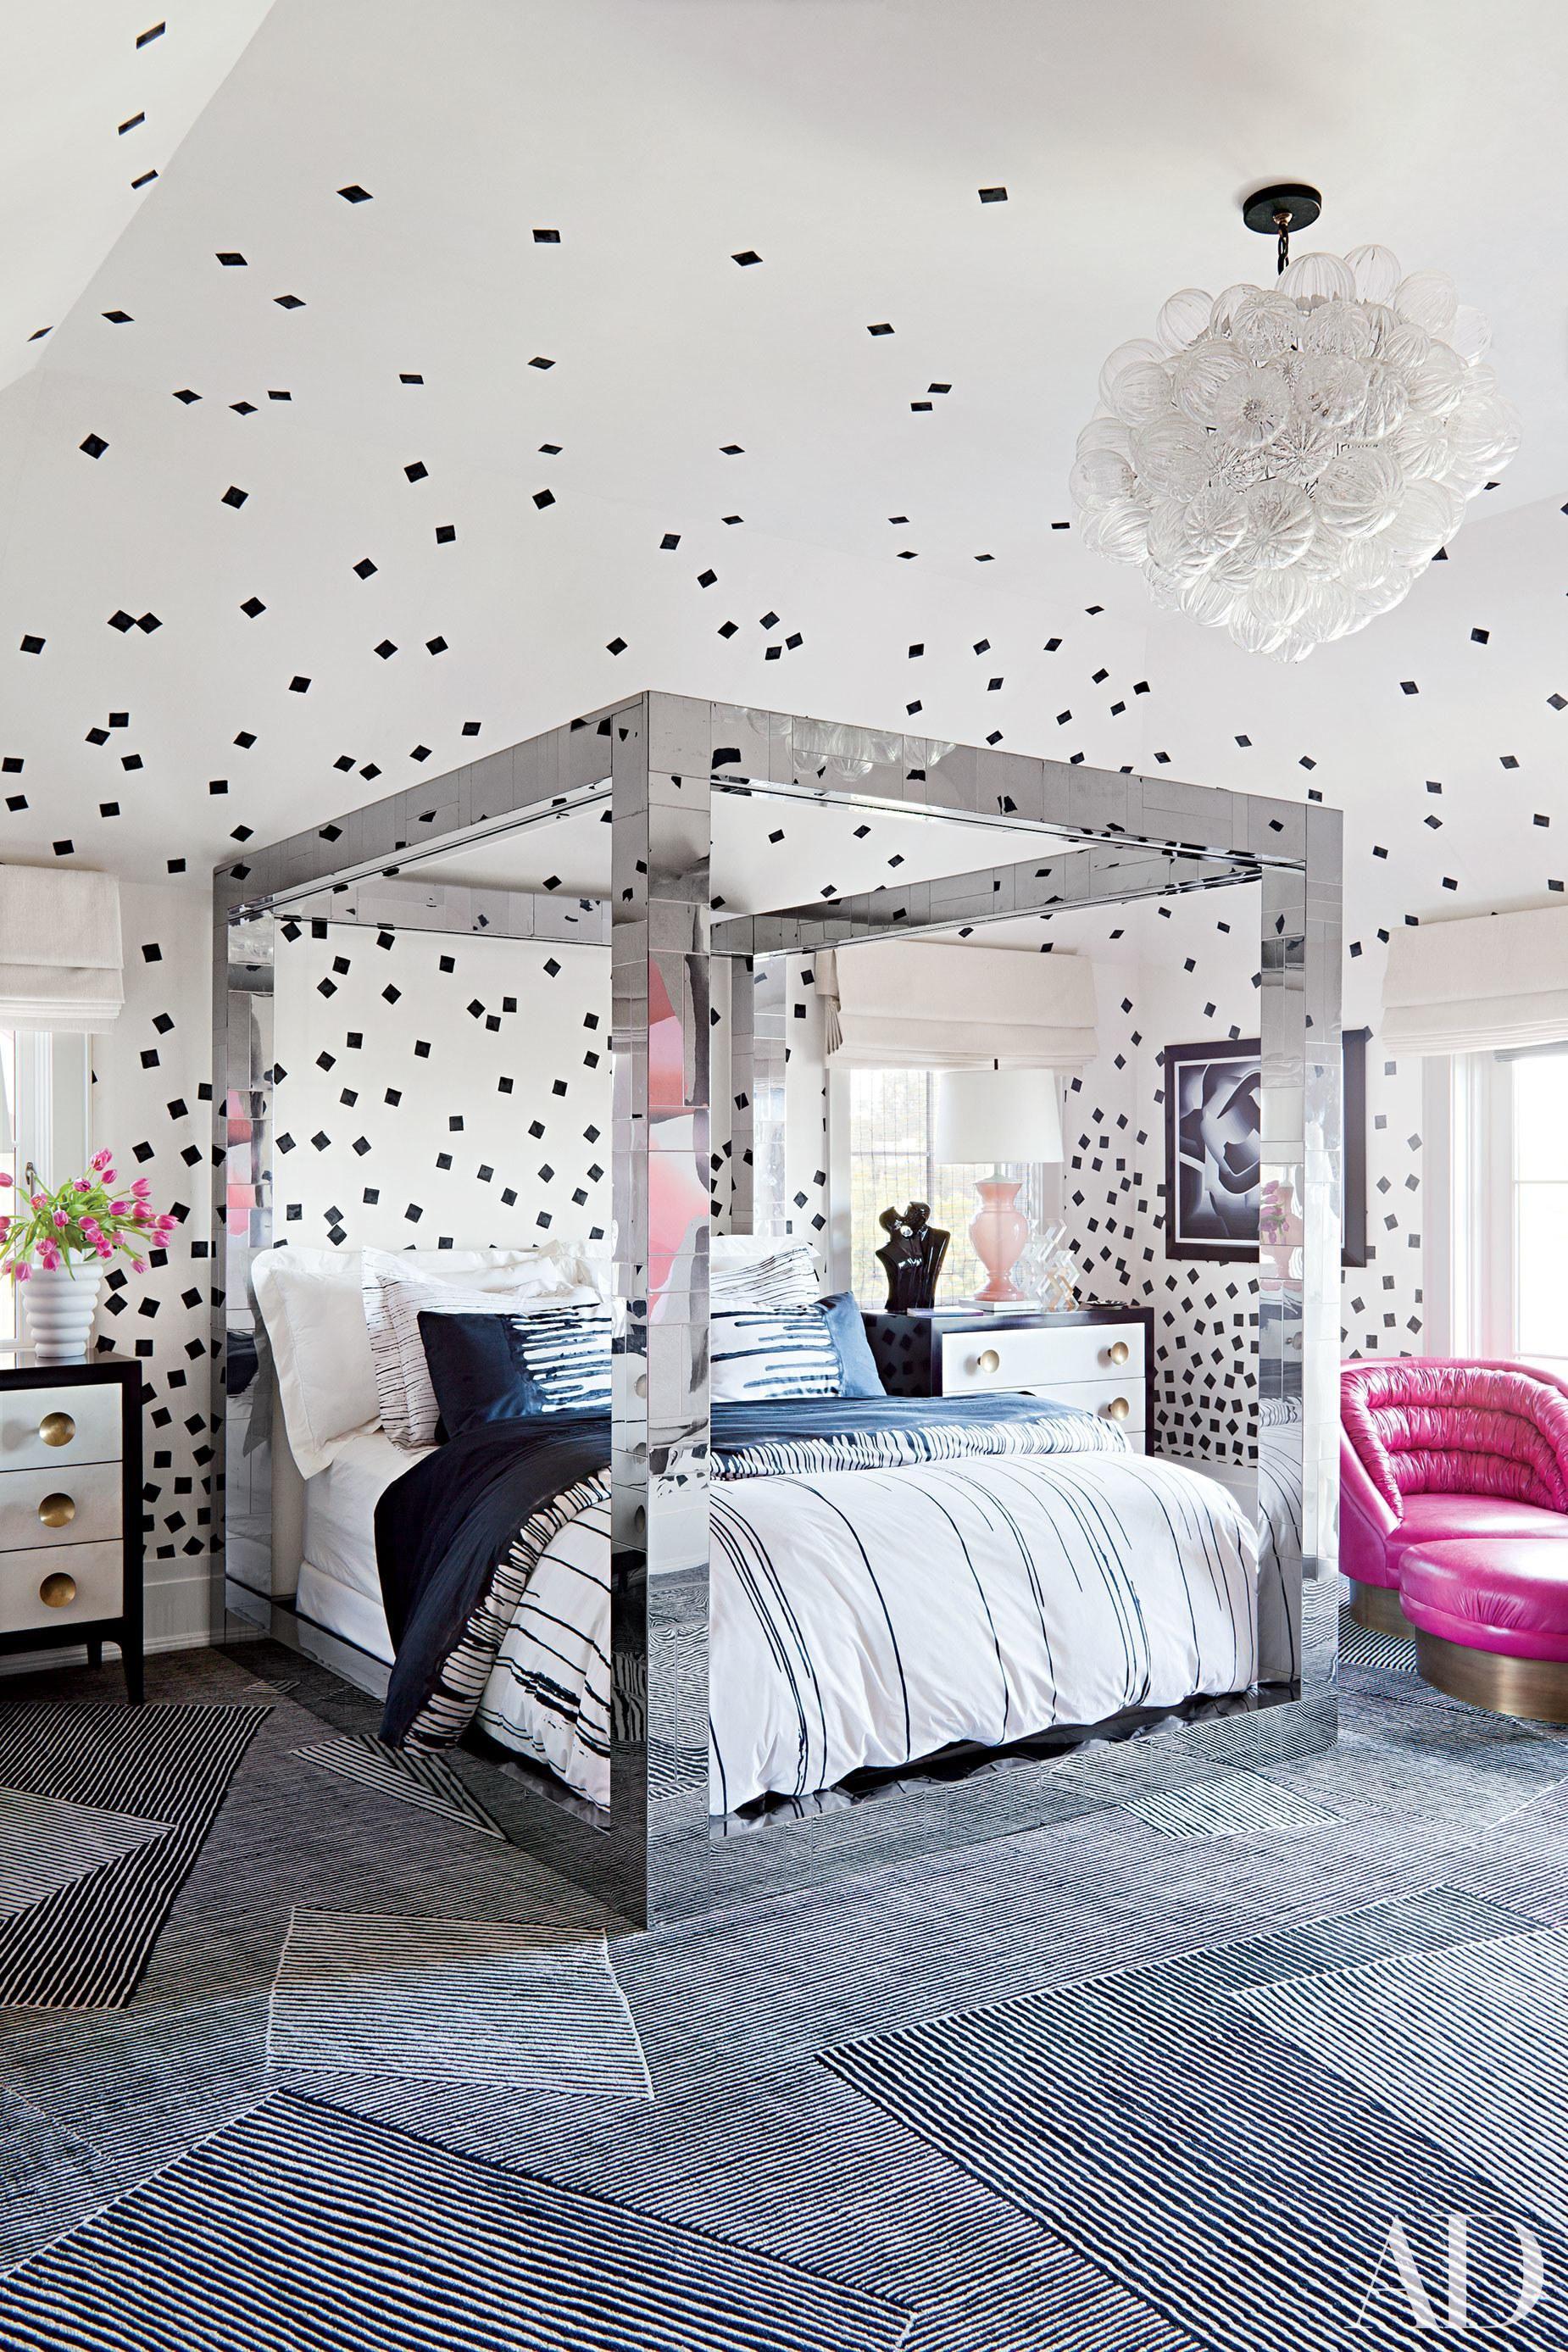 Design Bedroom · Discover 8 Of Kelly Wearstleru0027s Striking Interiors